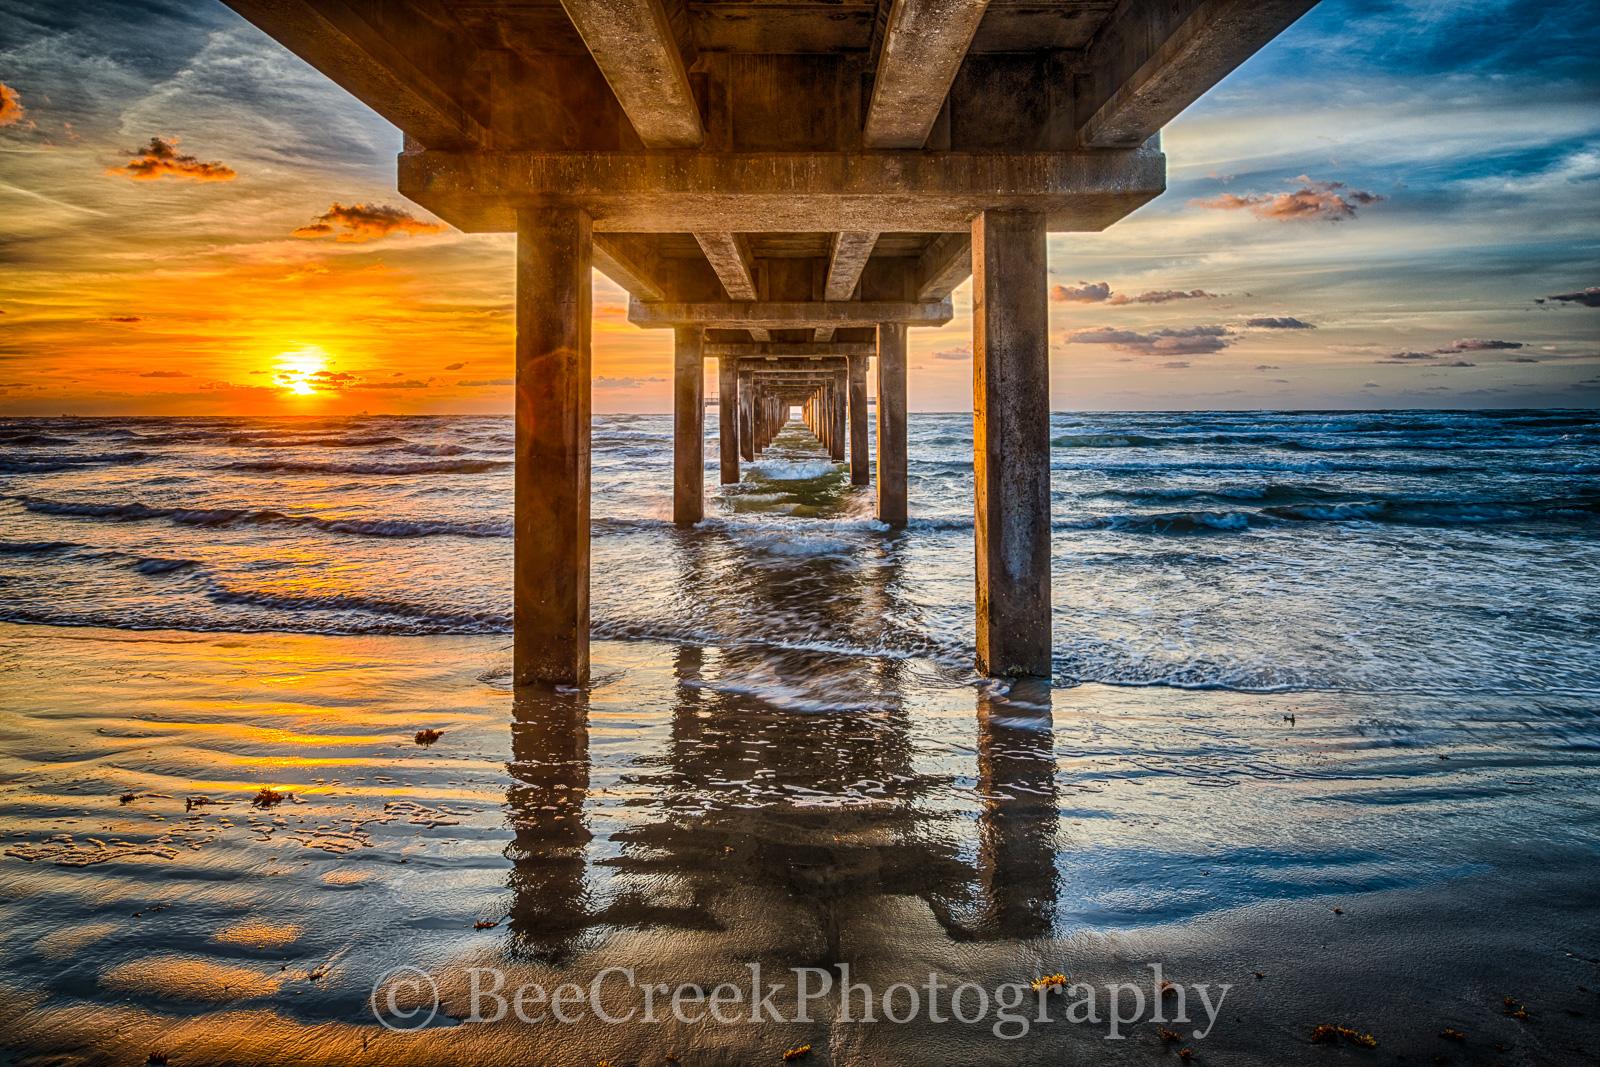 Caldwell pier, Port A, Port Aransas, Sunrise, Texas Coast, Texas beach, Texas coastal landscape, beach, beach ocean, coast, coastal, colorful sunrise, fishing pier, gulf of mexico, landscape, landscap